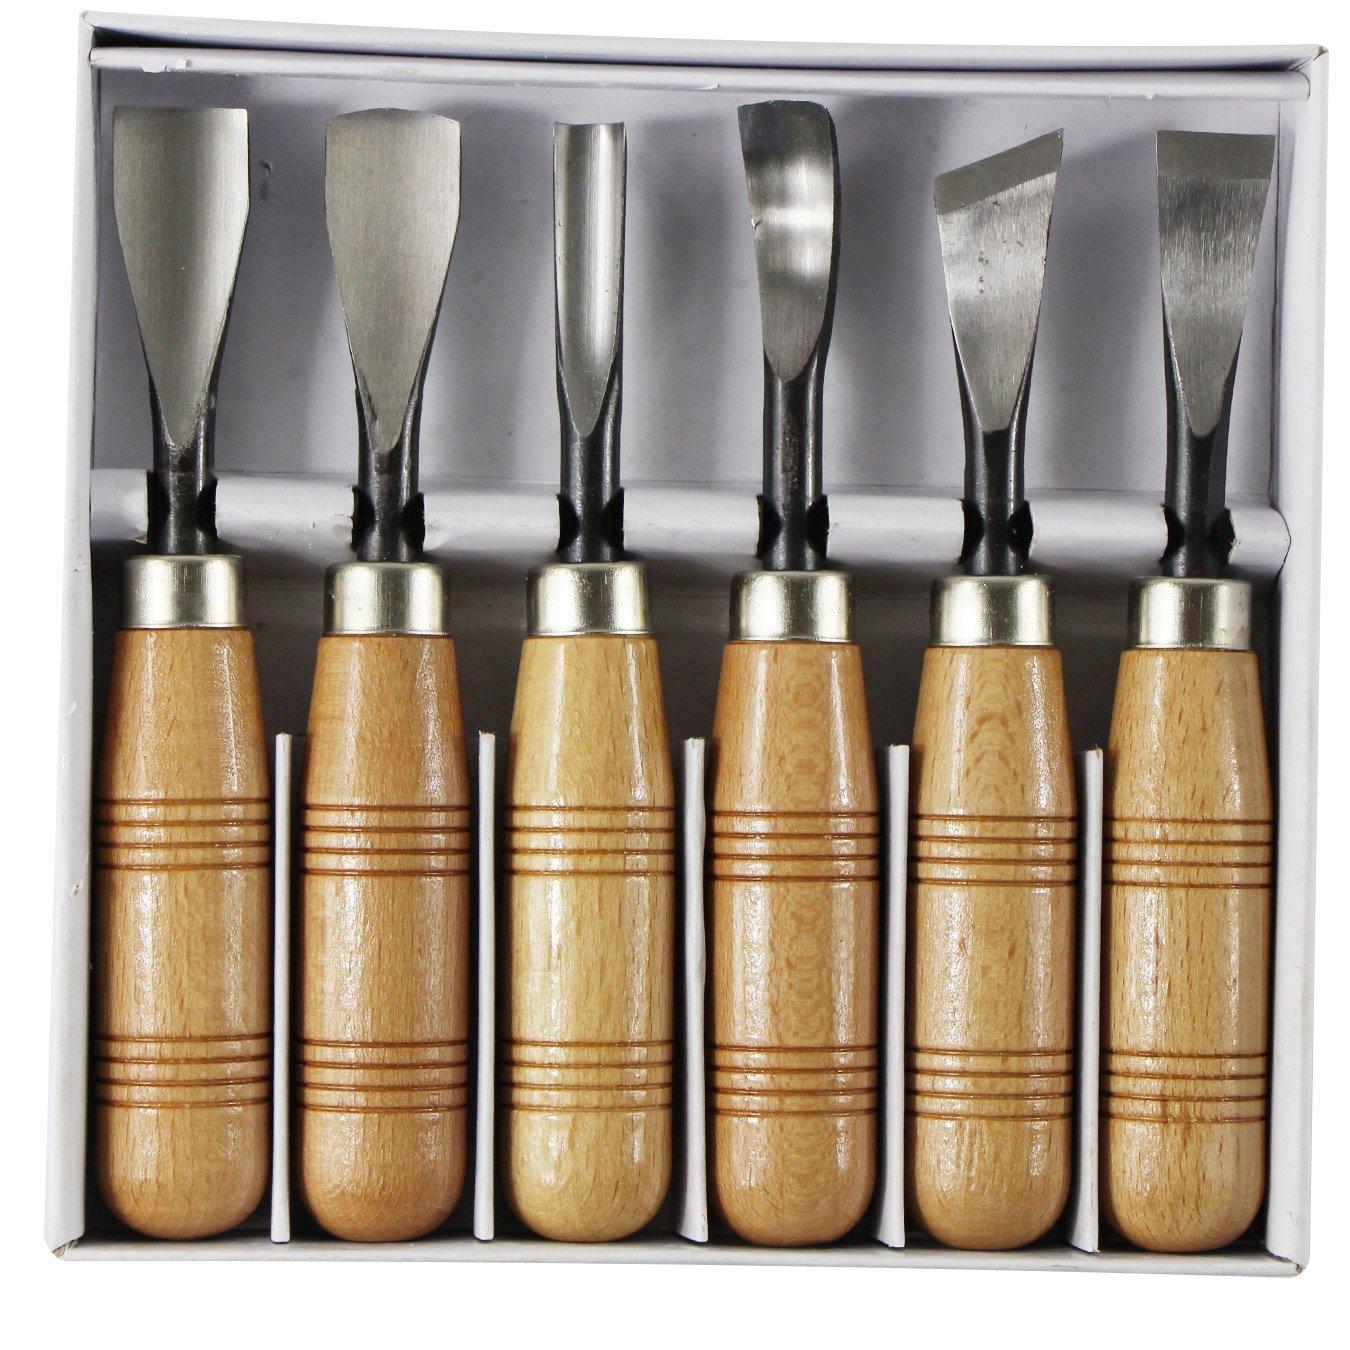 uooom 6 pc para tallar madera juego de cinceles profesionales para tallar madera afilar herramienta con mango de madera, 6pcs/set